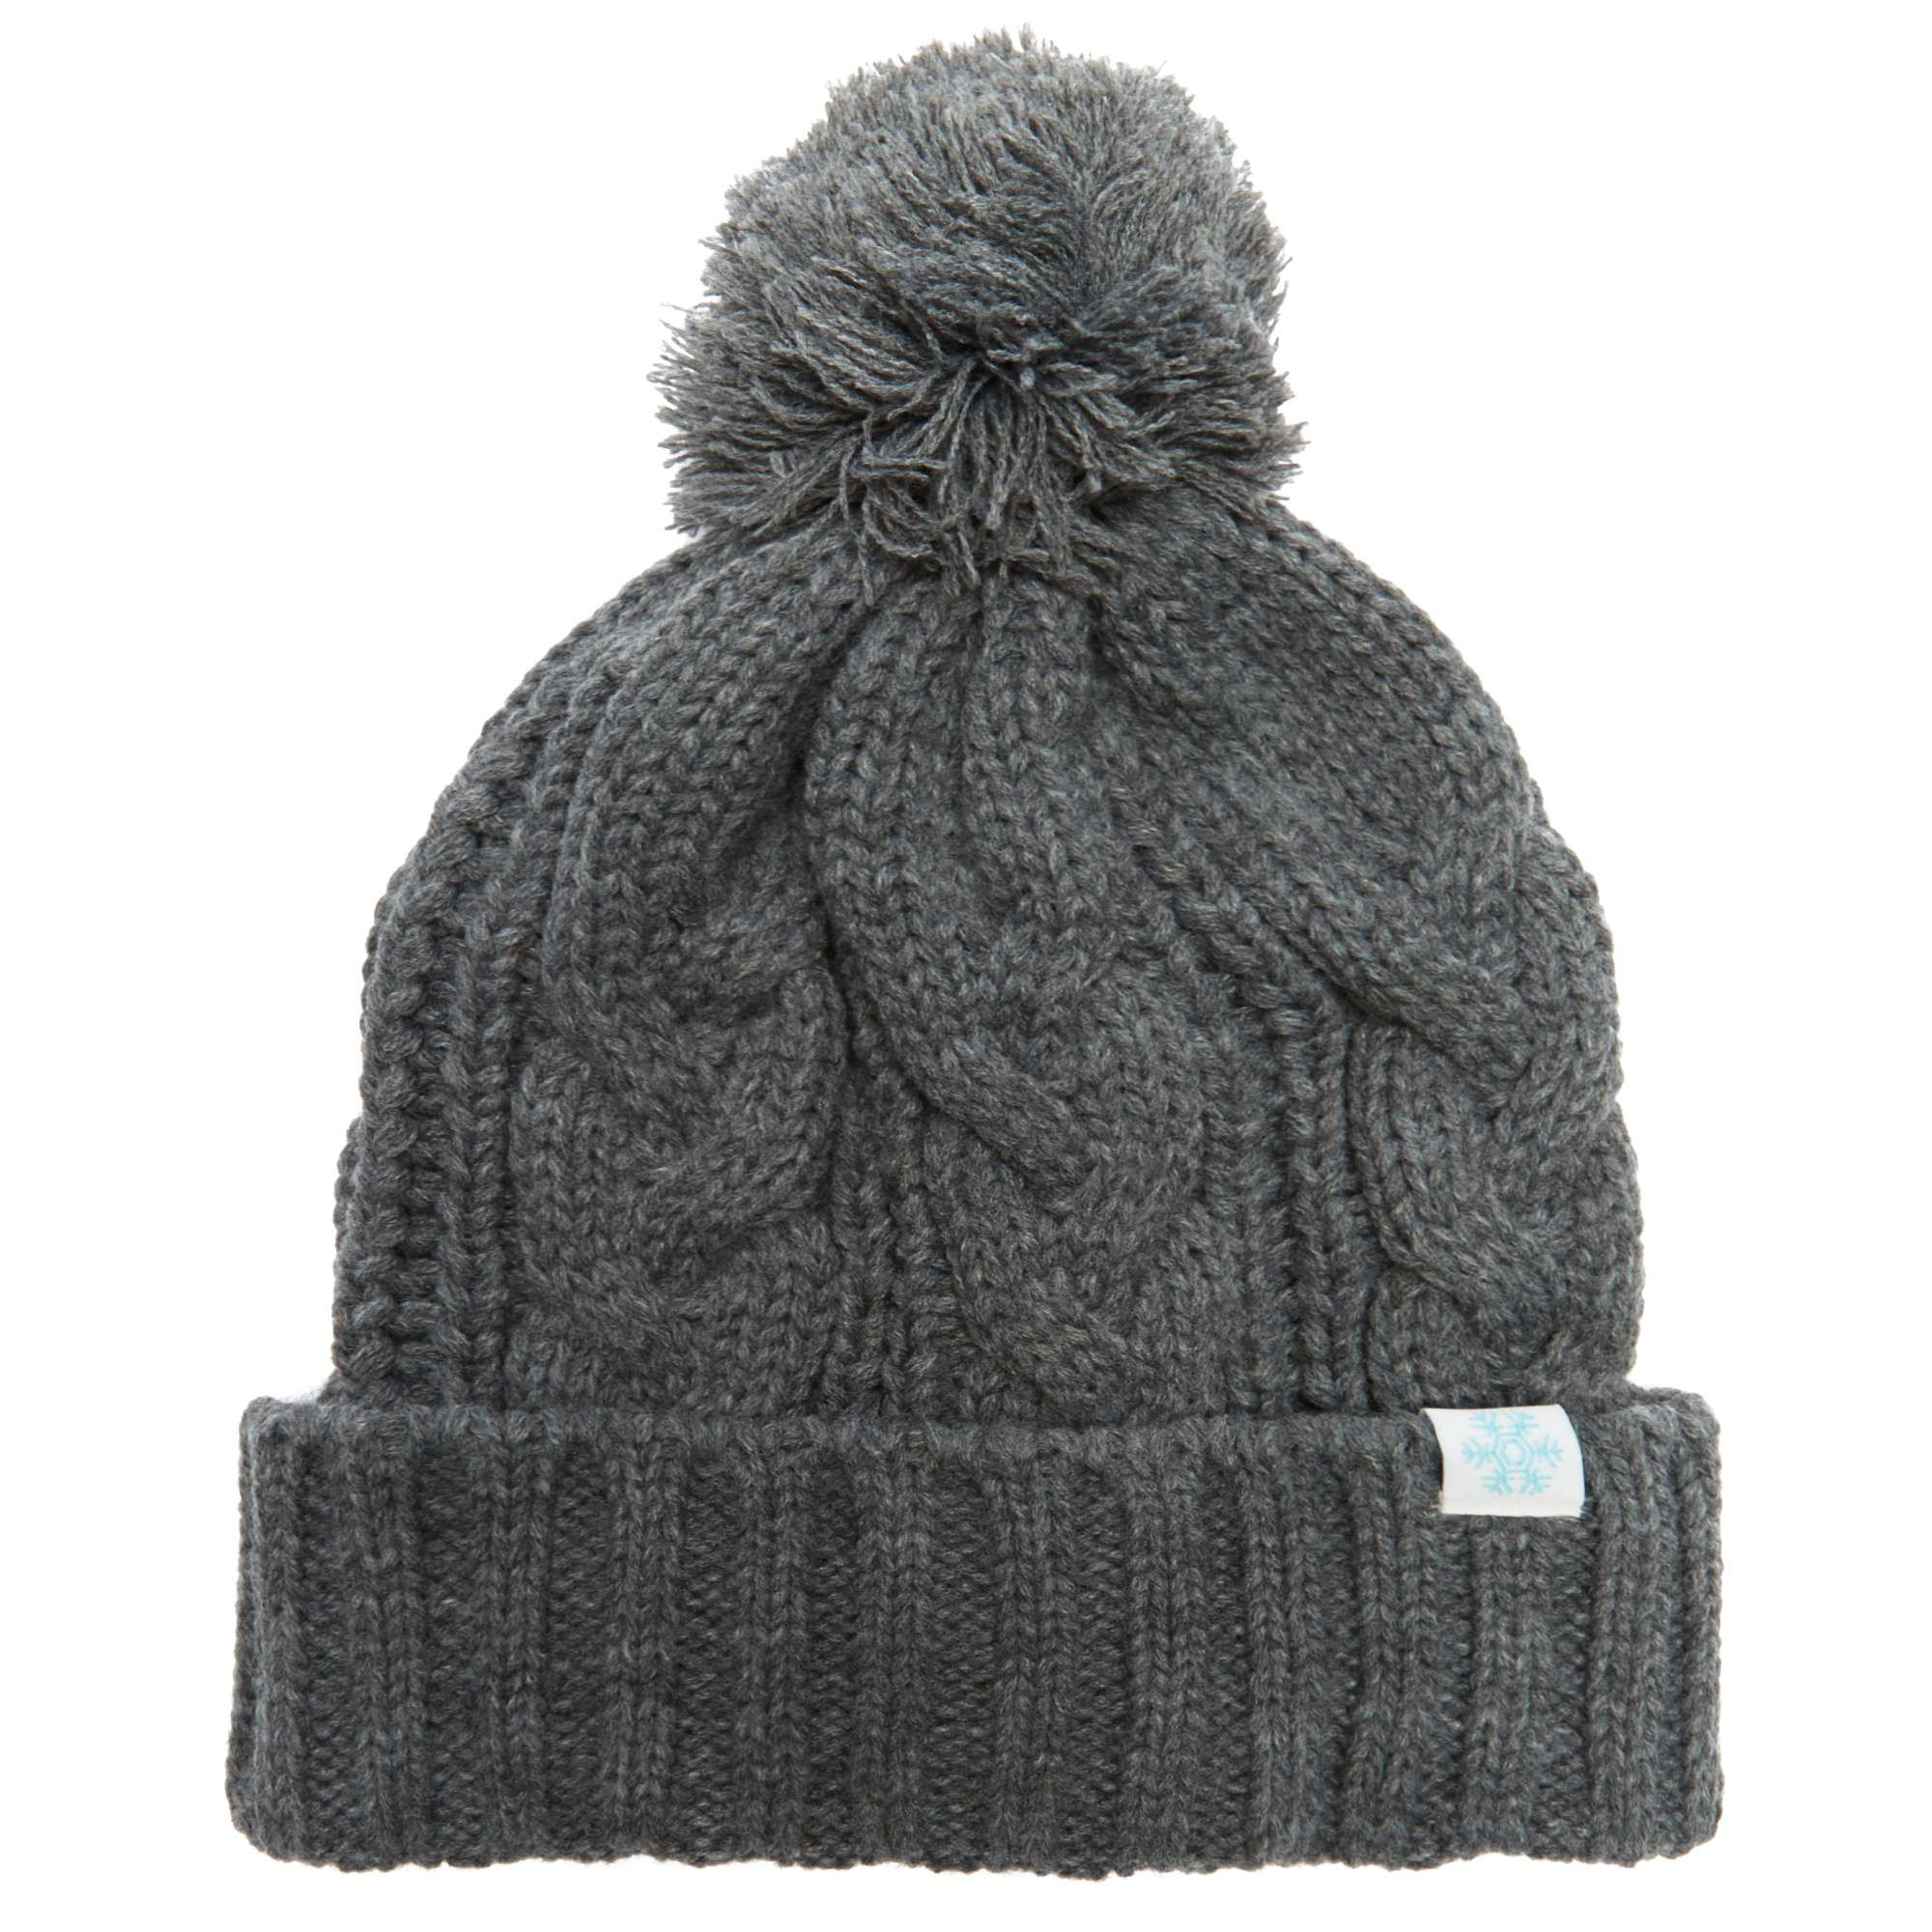 ALPINE Men's Cable Knit Pom Pom Hat